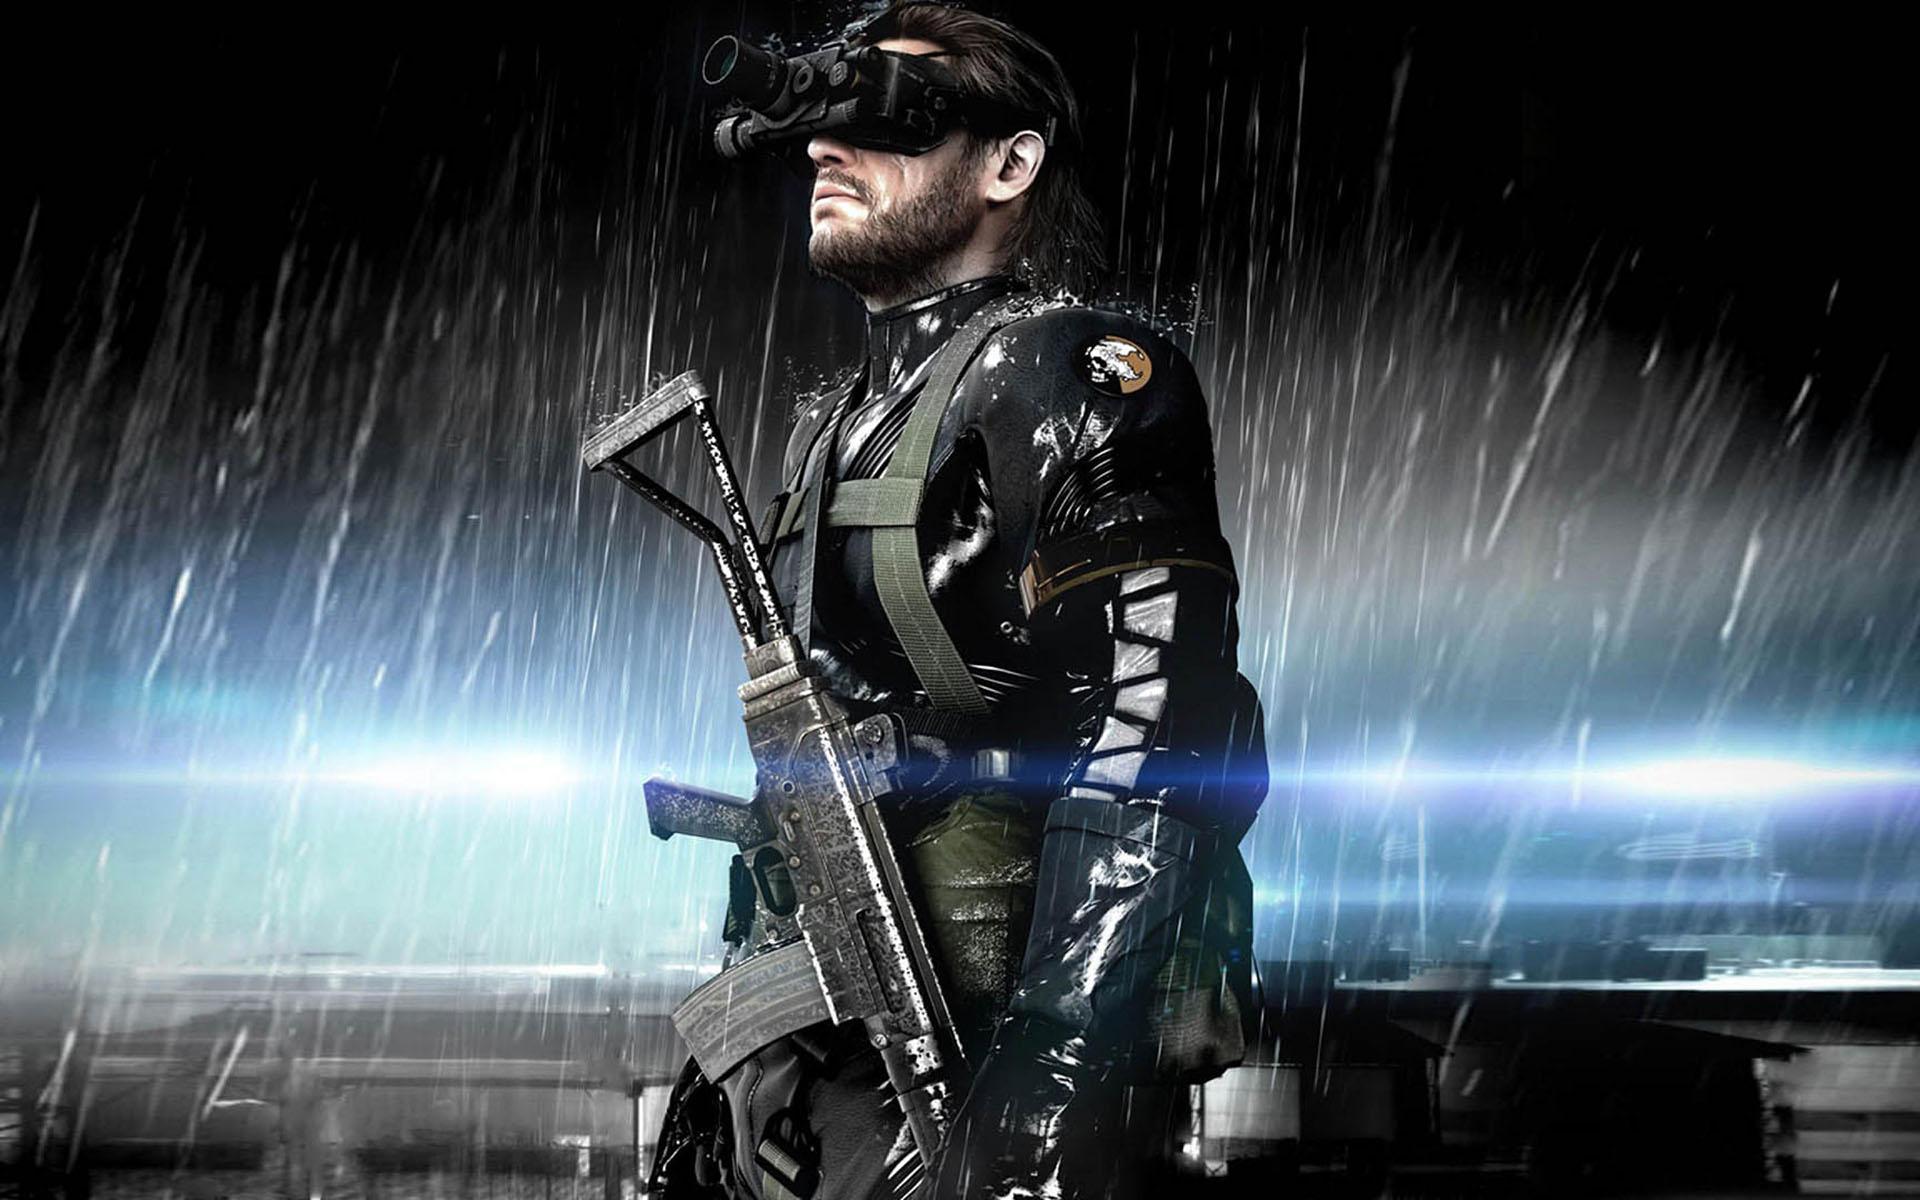 Wallpaper : video games, futuristic, soldier, Metal Gear